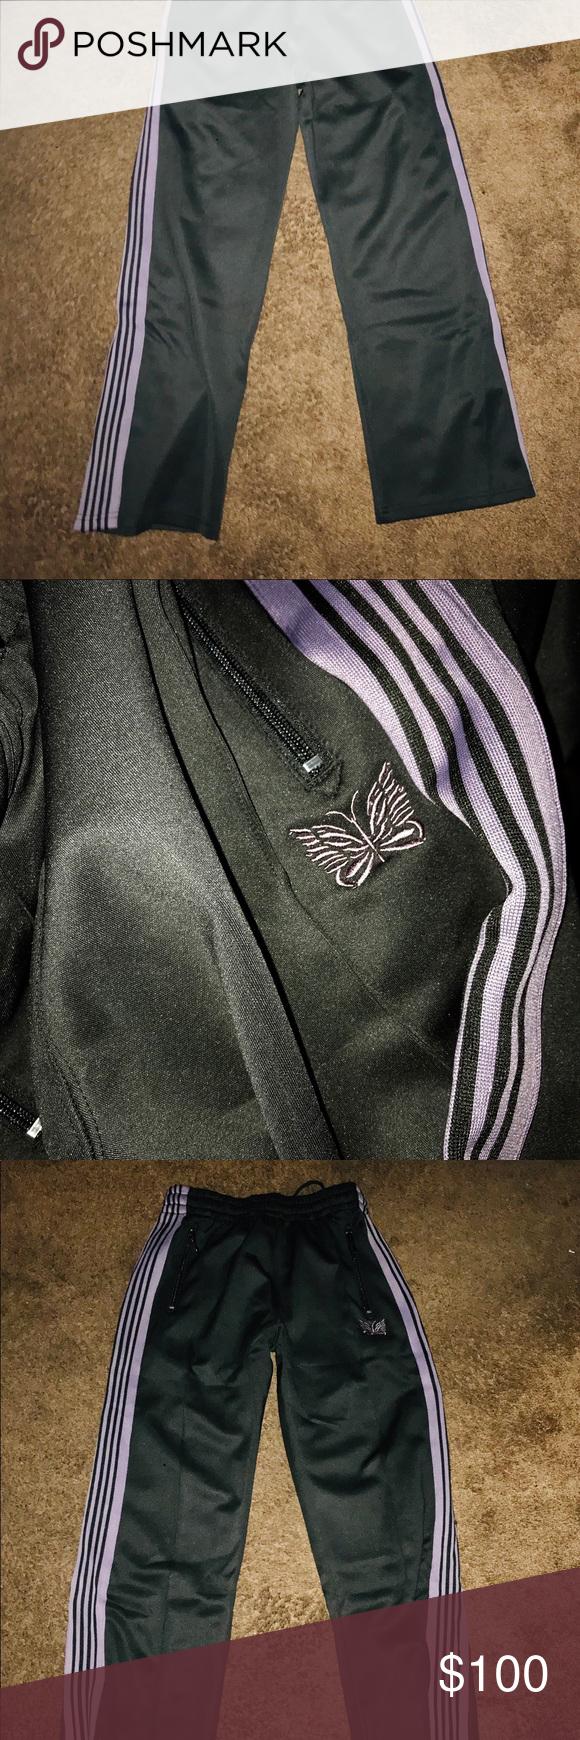 combinar policía mantener  Awge sweatpants | Clothes design, Fashion, Fashion trends